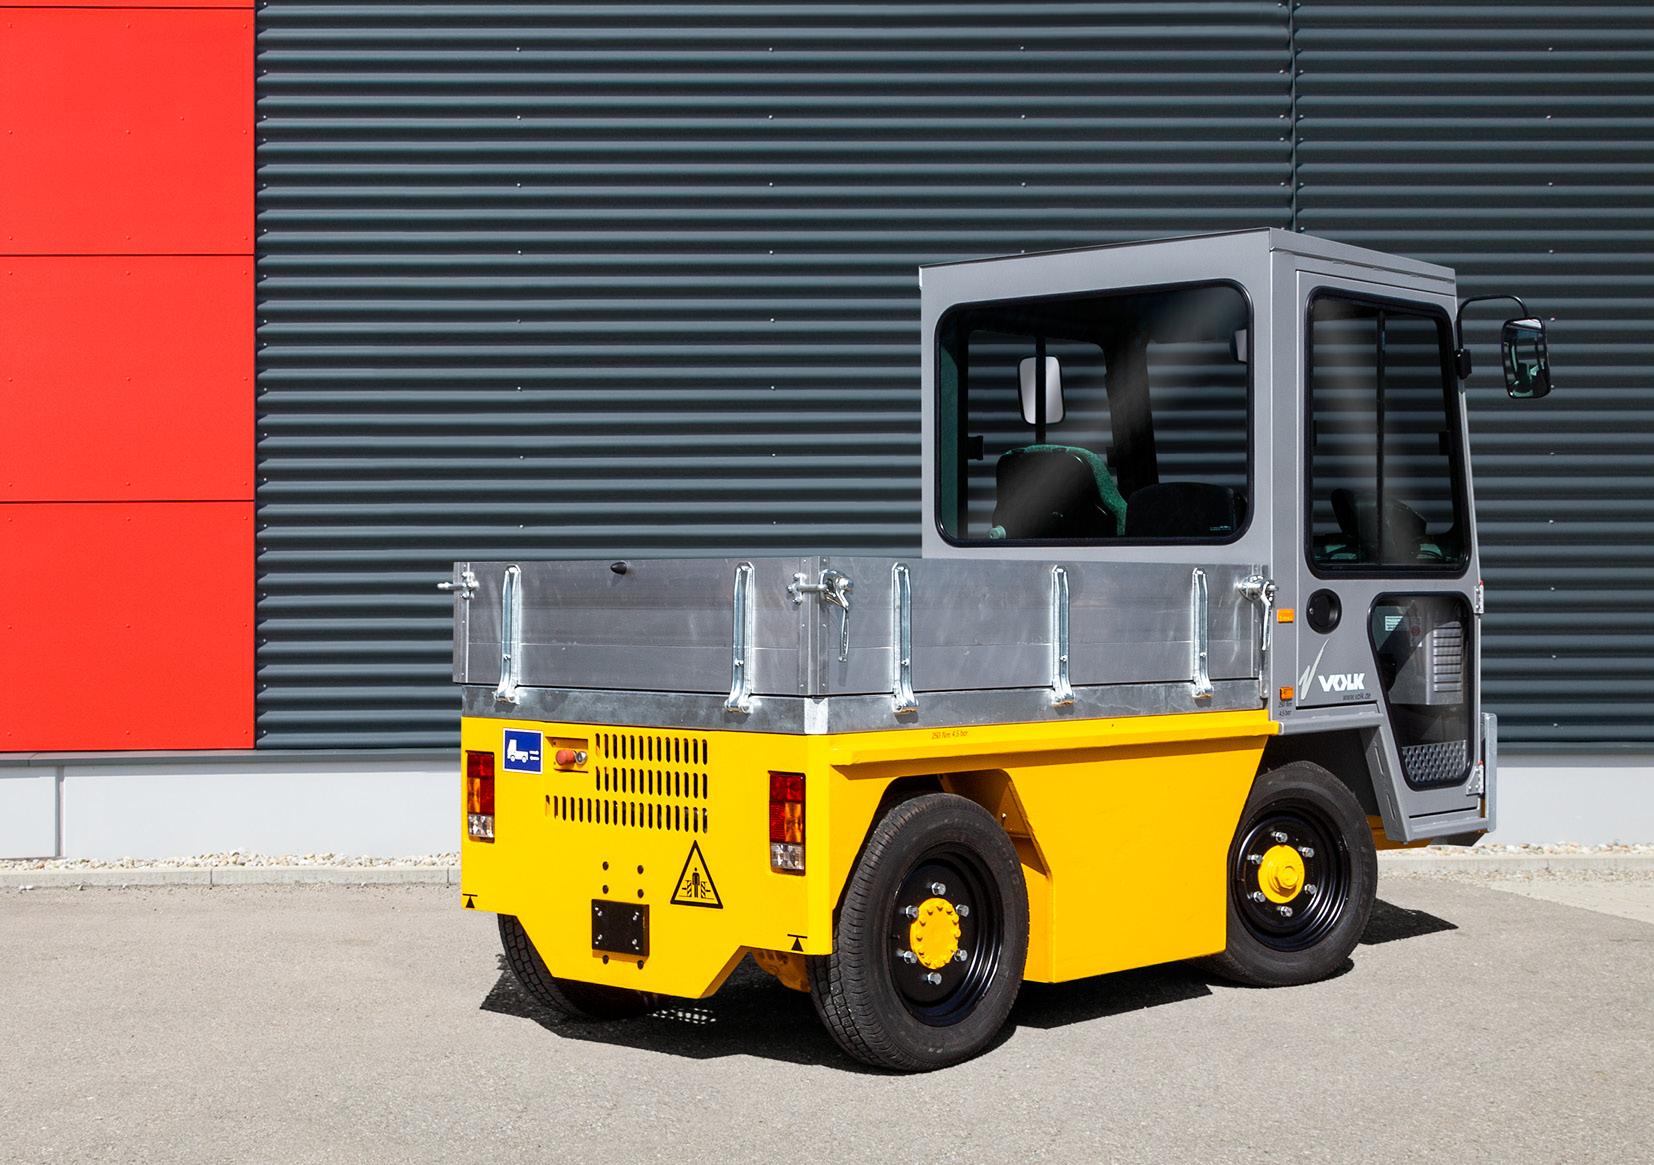 VOLK Electric Platform Truck EFW 2 Used